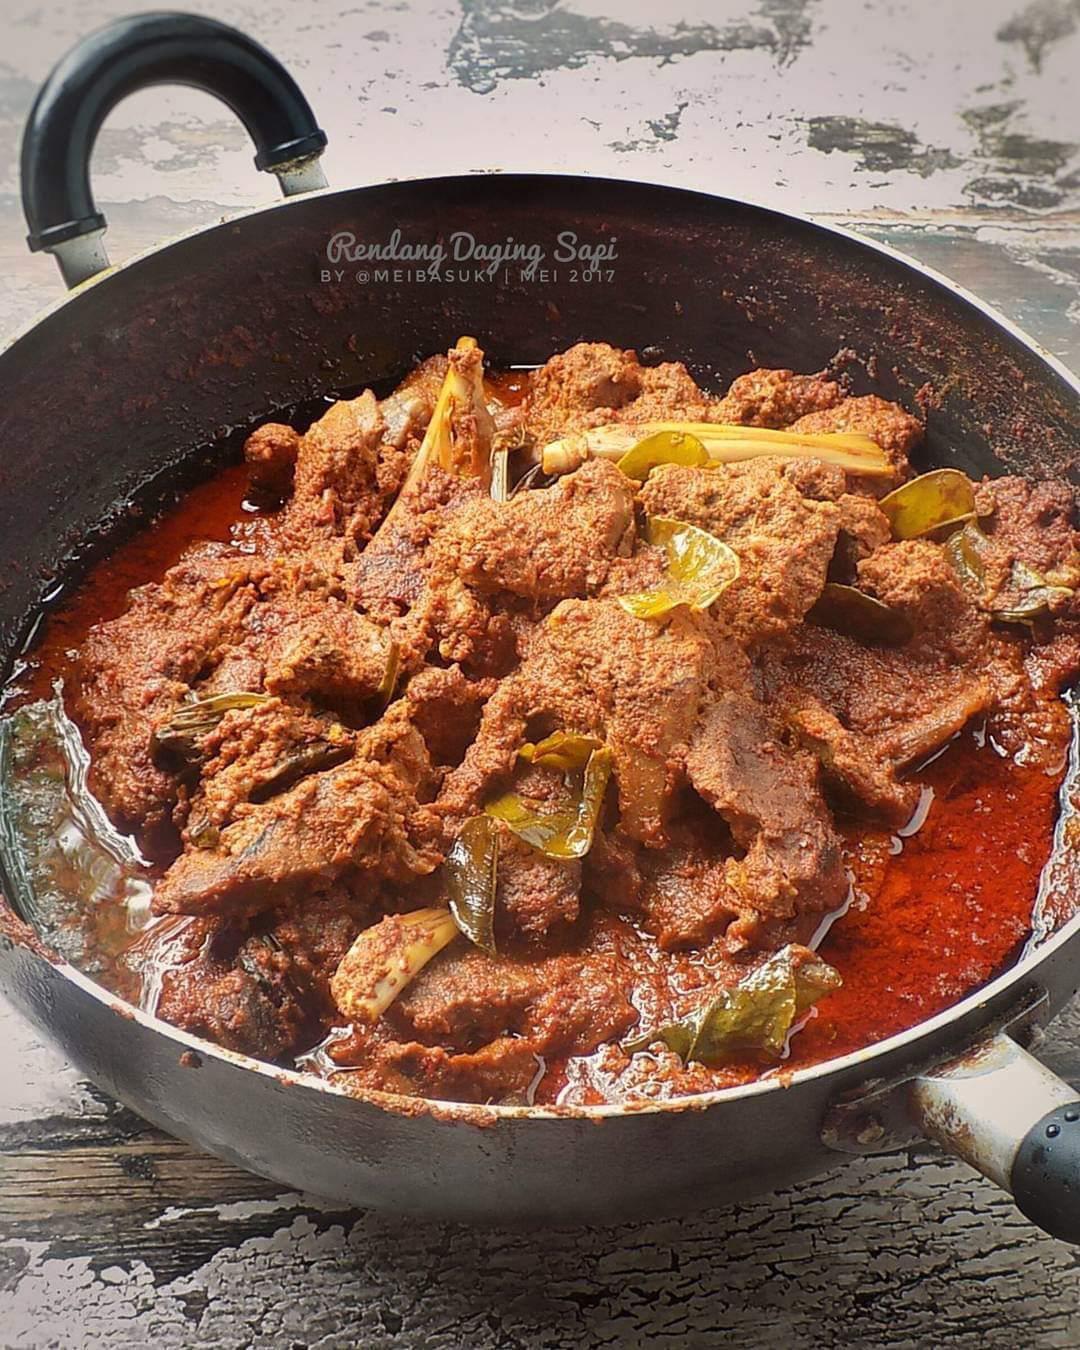 Sajian Rendang Daging Sapi, Resep Masakan Rumahan